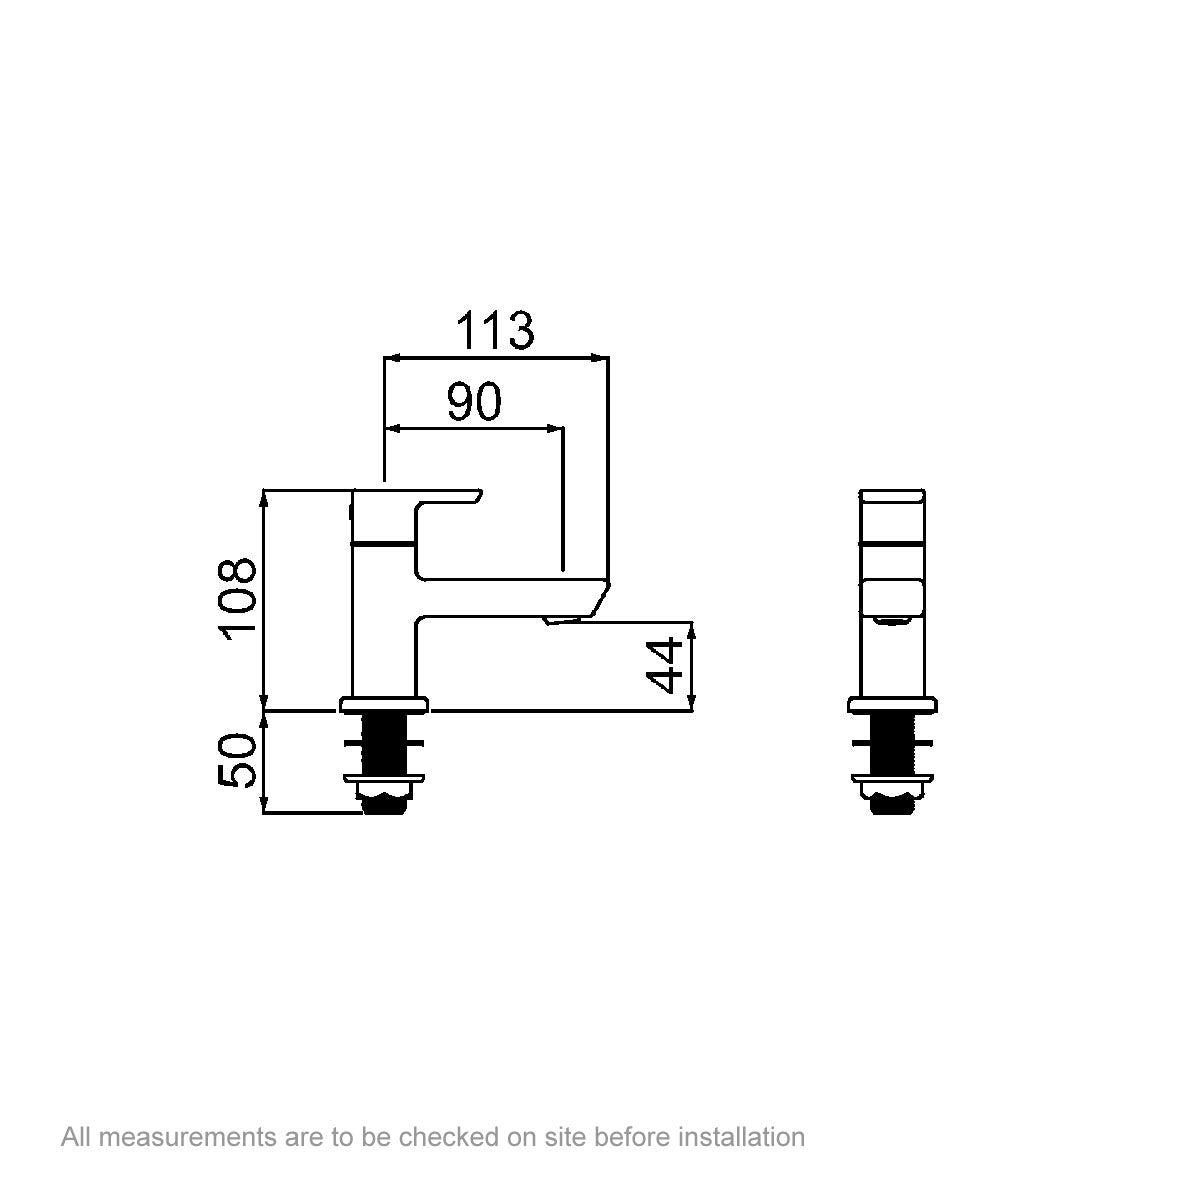 Dimensions for Bristan Cobalt basin taps